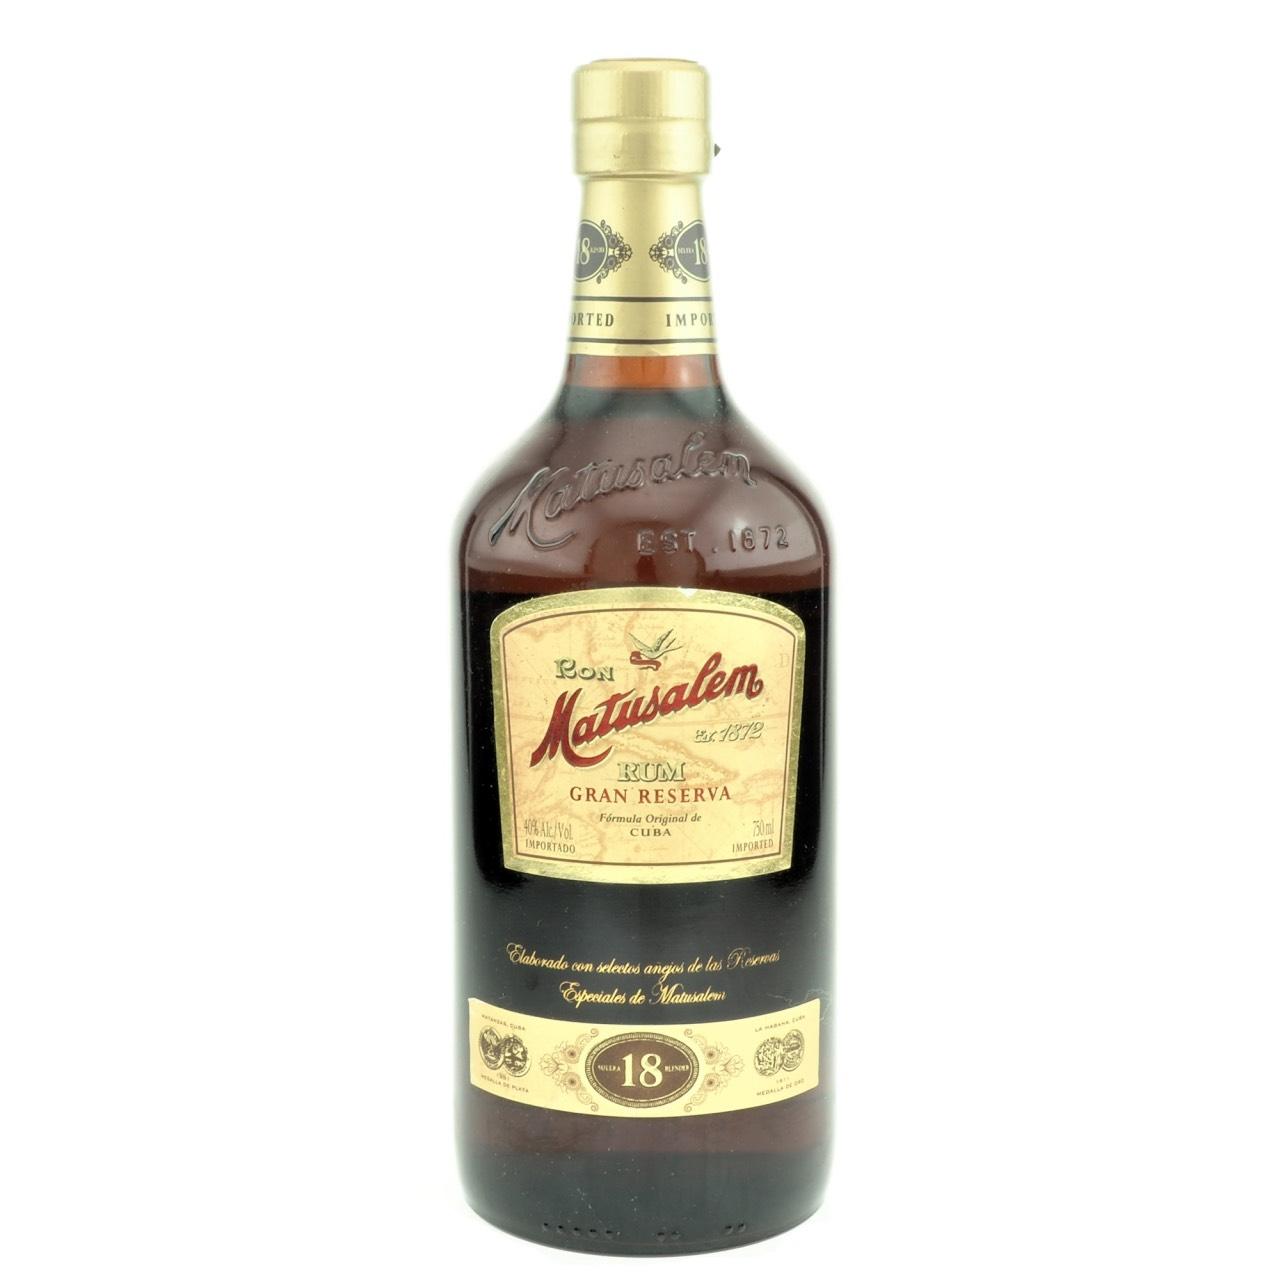 Bottle image of Gran Reserva 18 Años